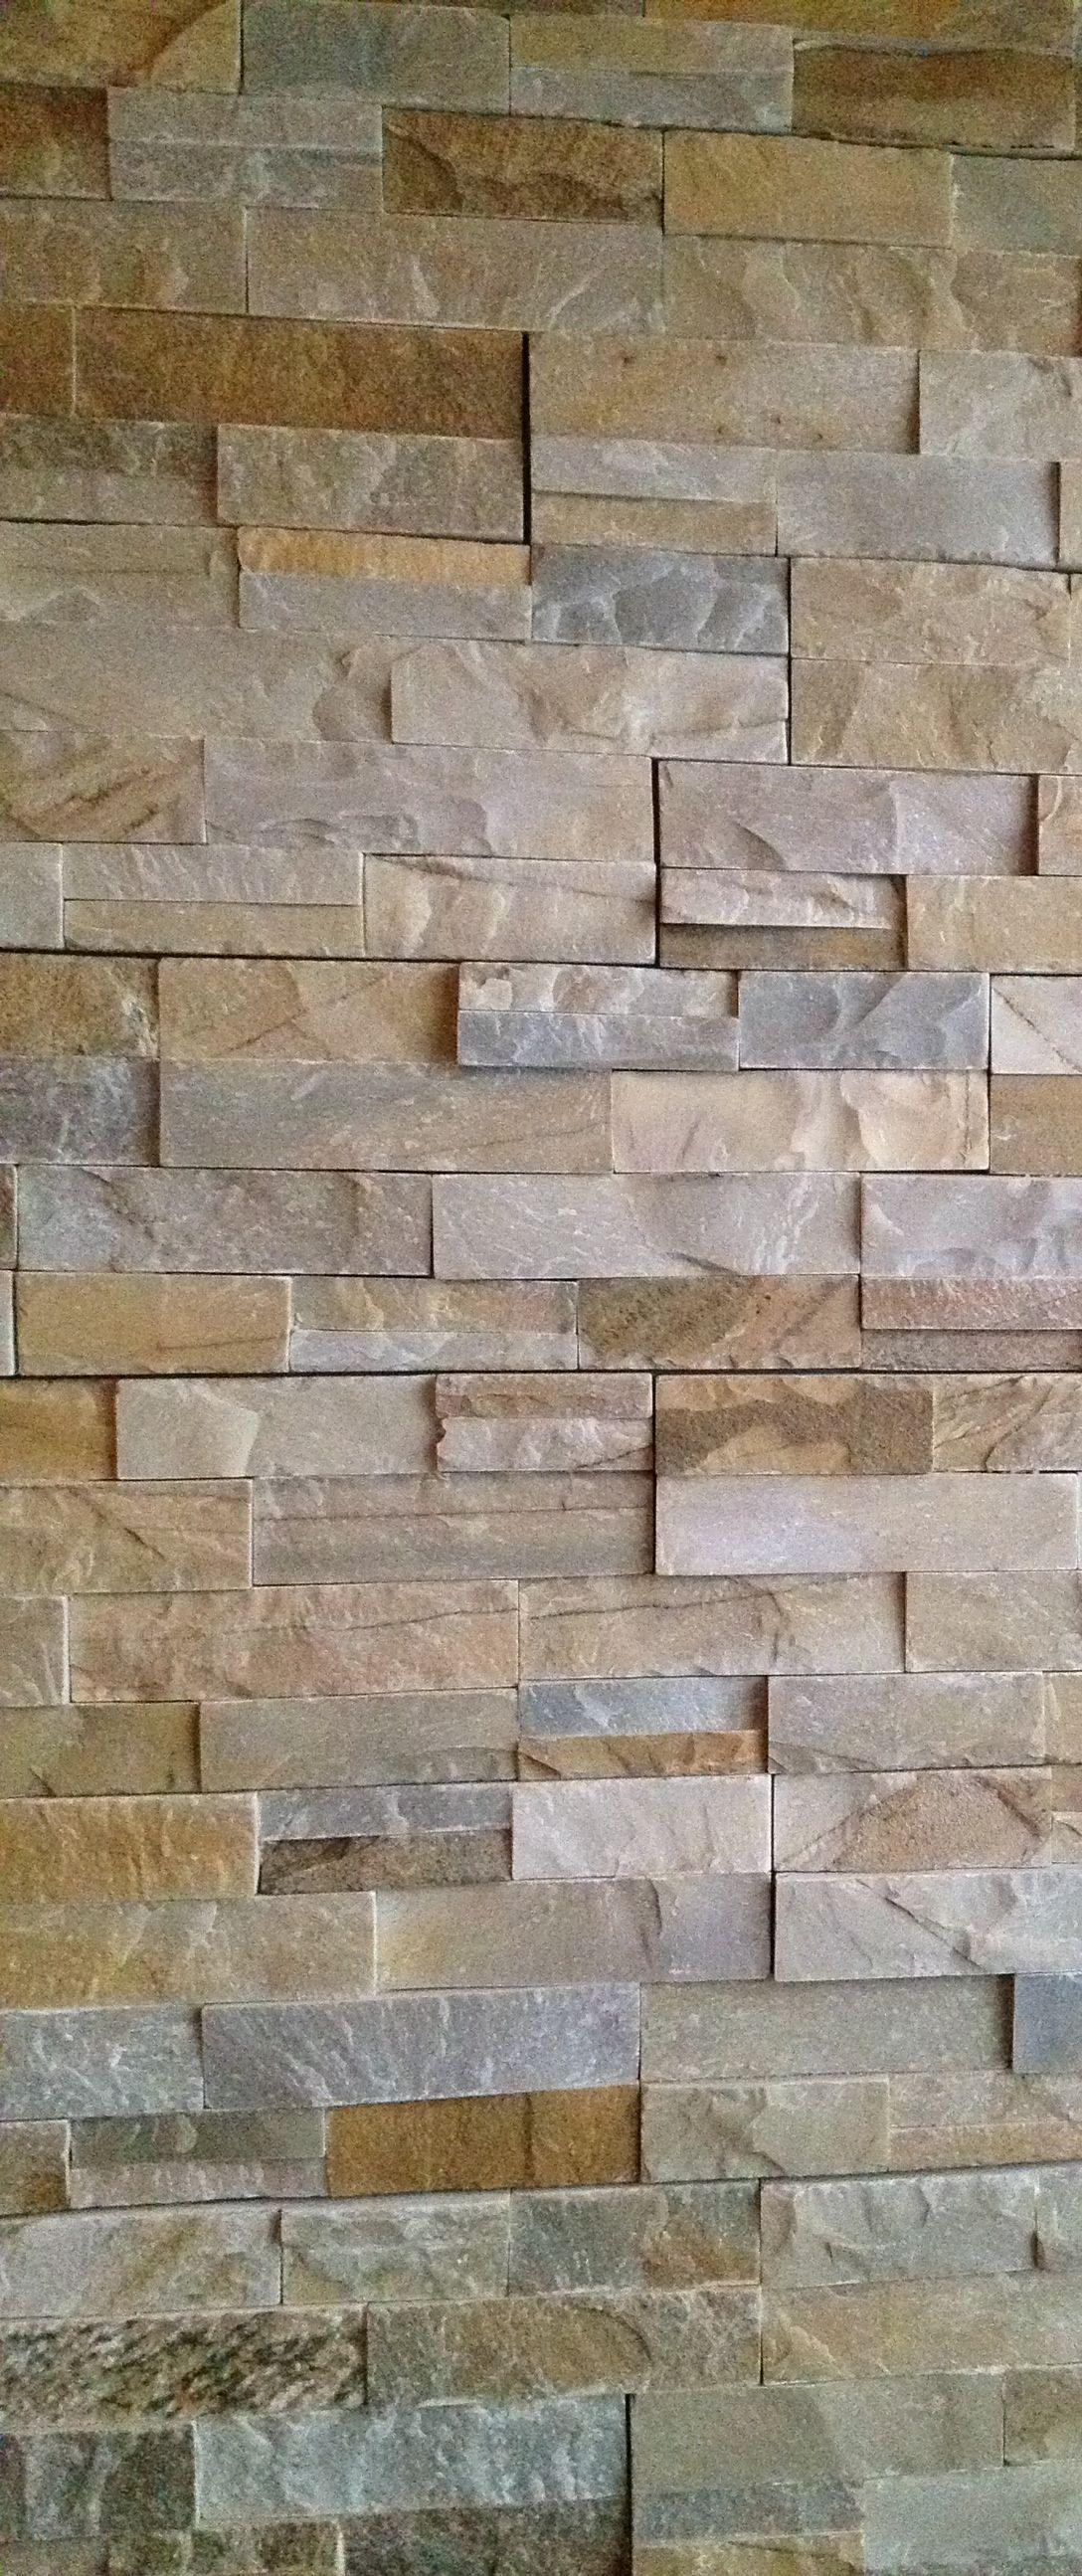 Desert quartz ledgestone natural stone wall tile x